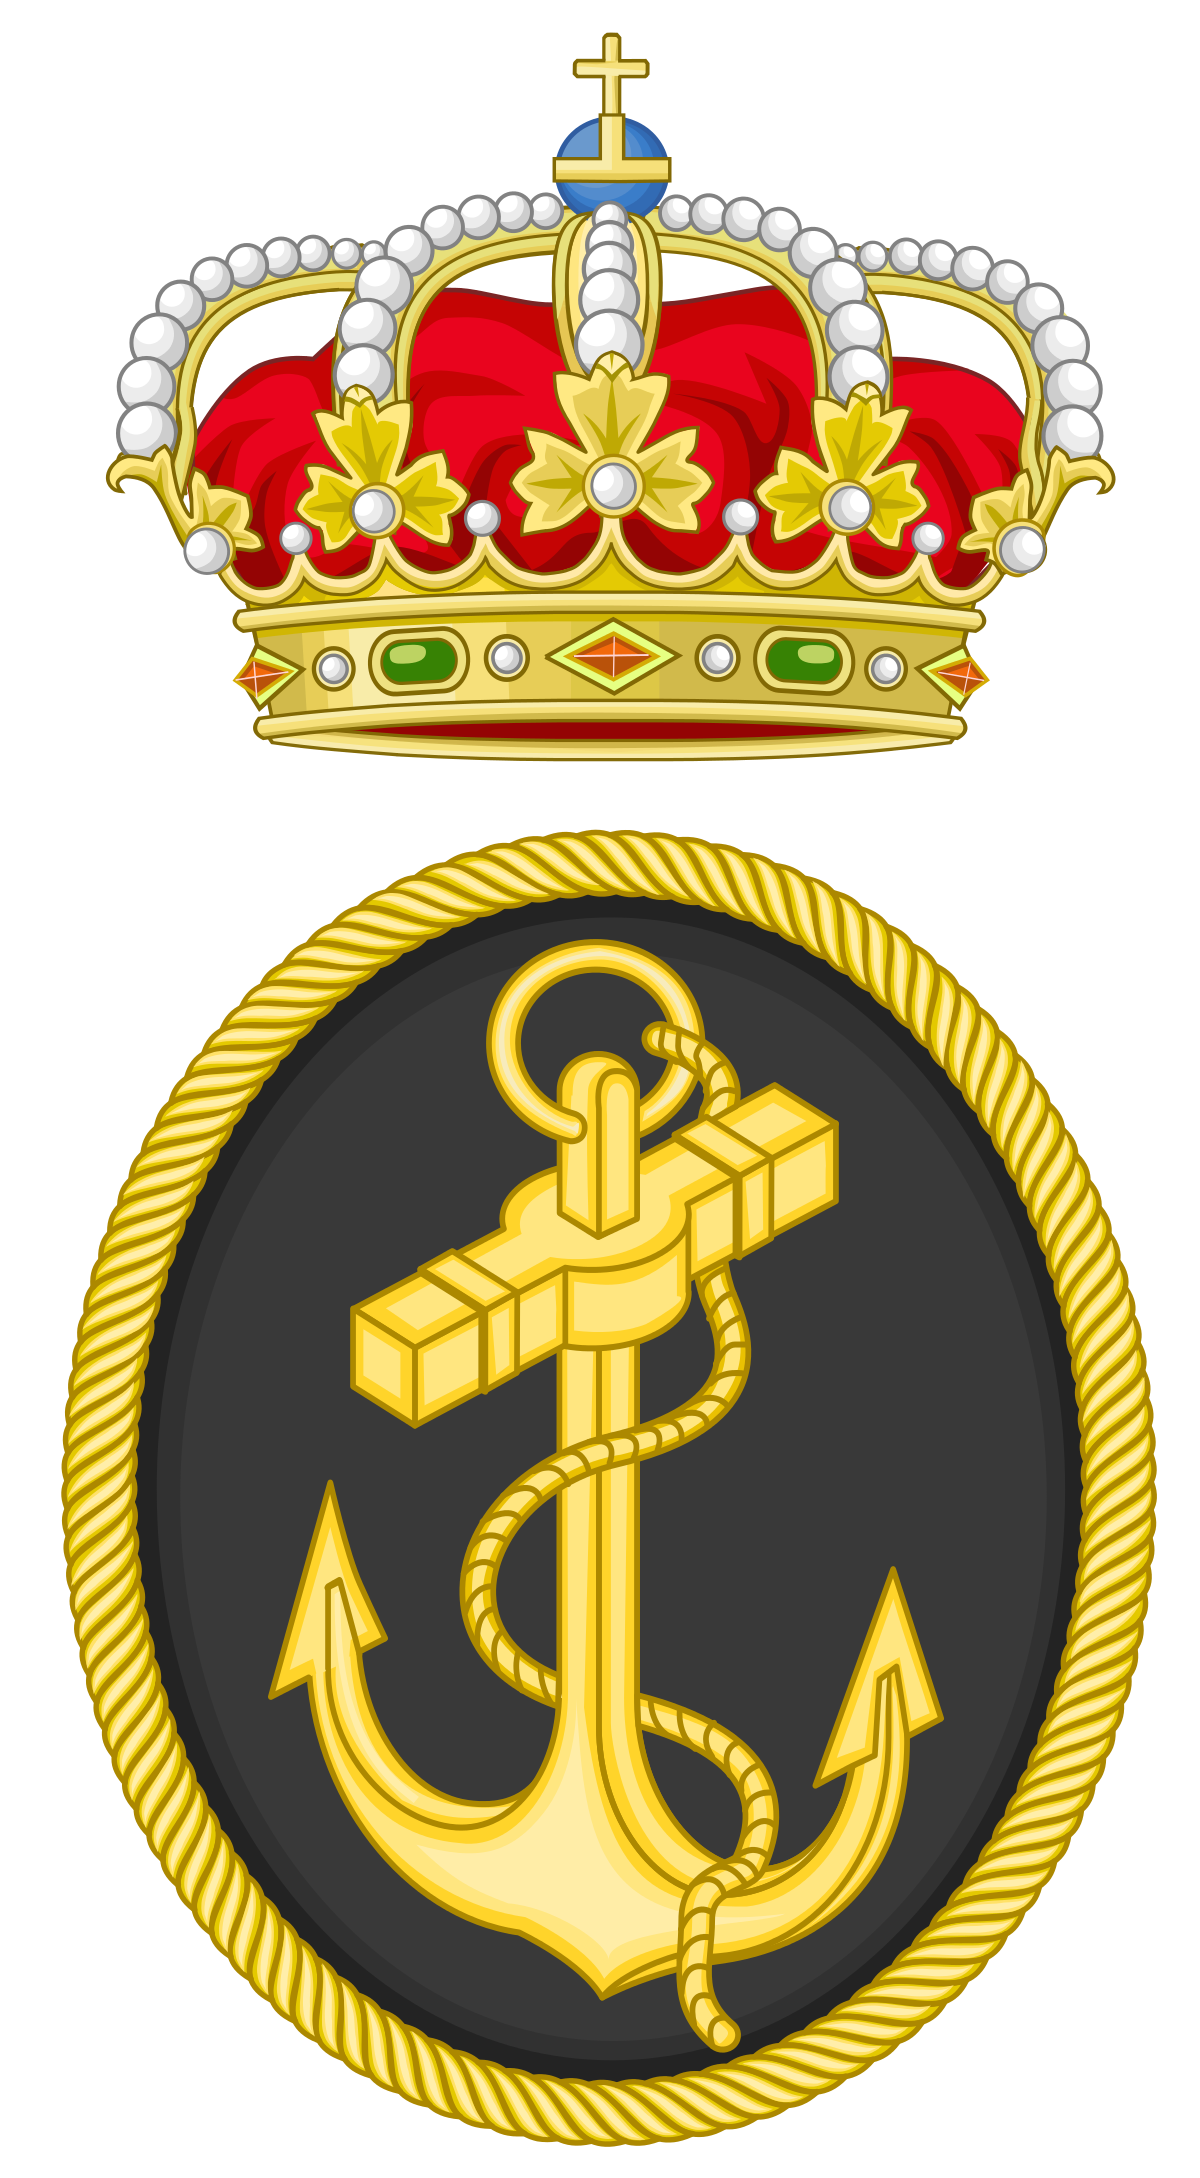 clip transparent stock Christopher columbus clipart wikipedia. Spanish navy .